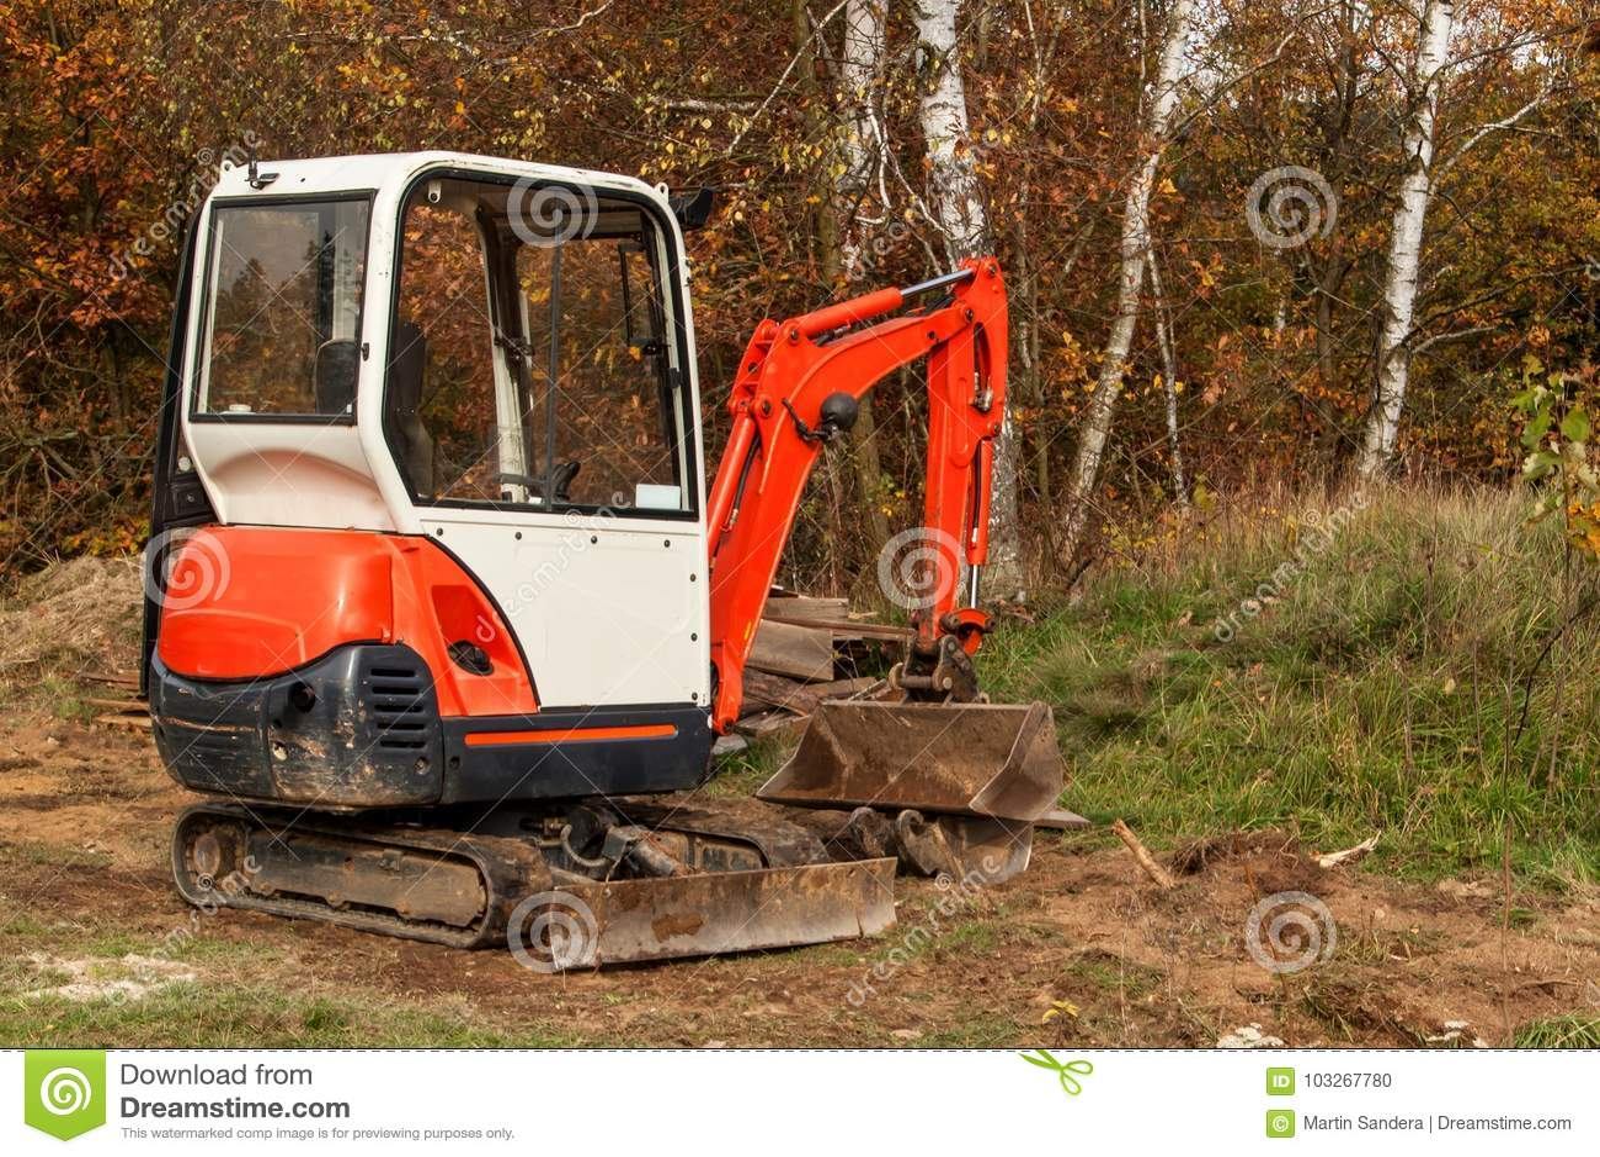 Mini Excavator On A Building Site. Excavation Work. The Excavator ...